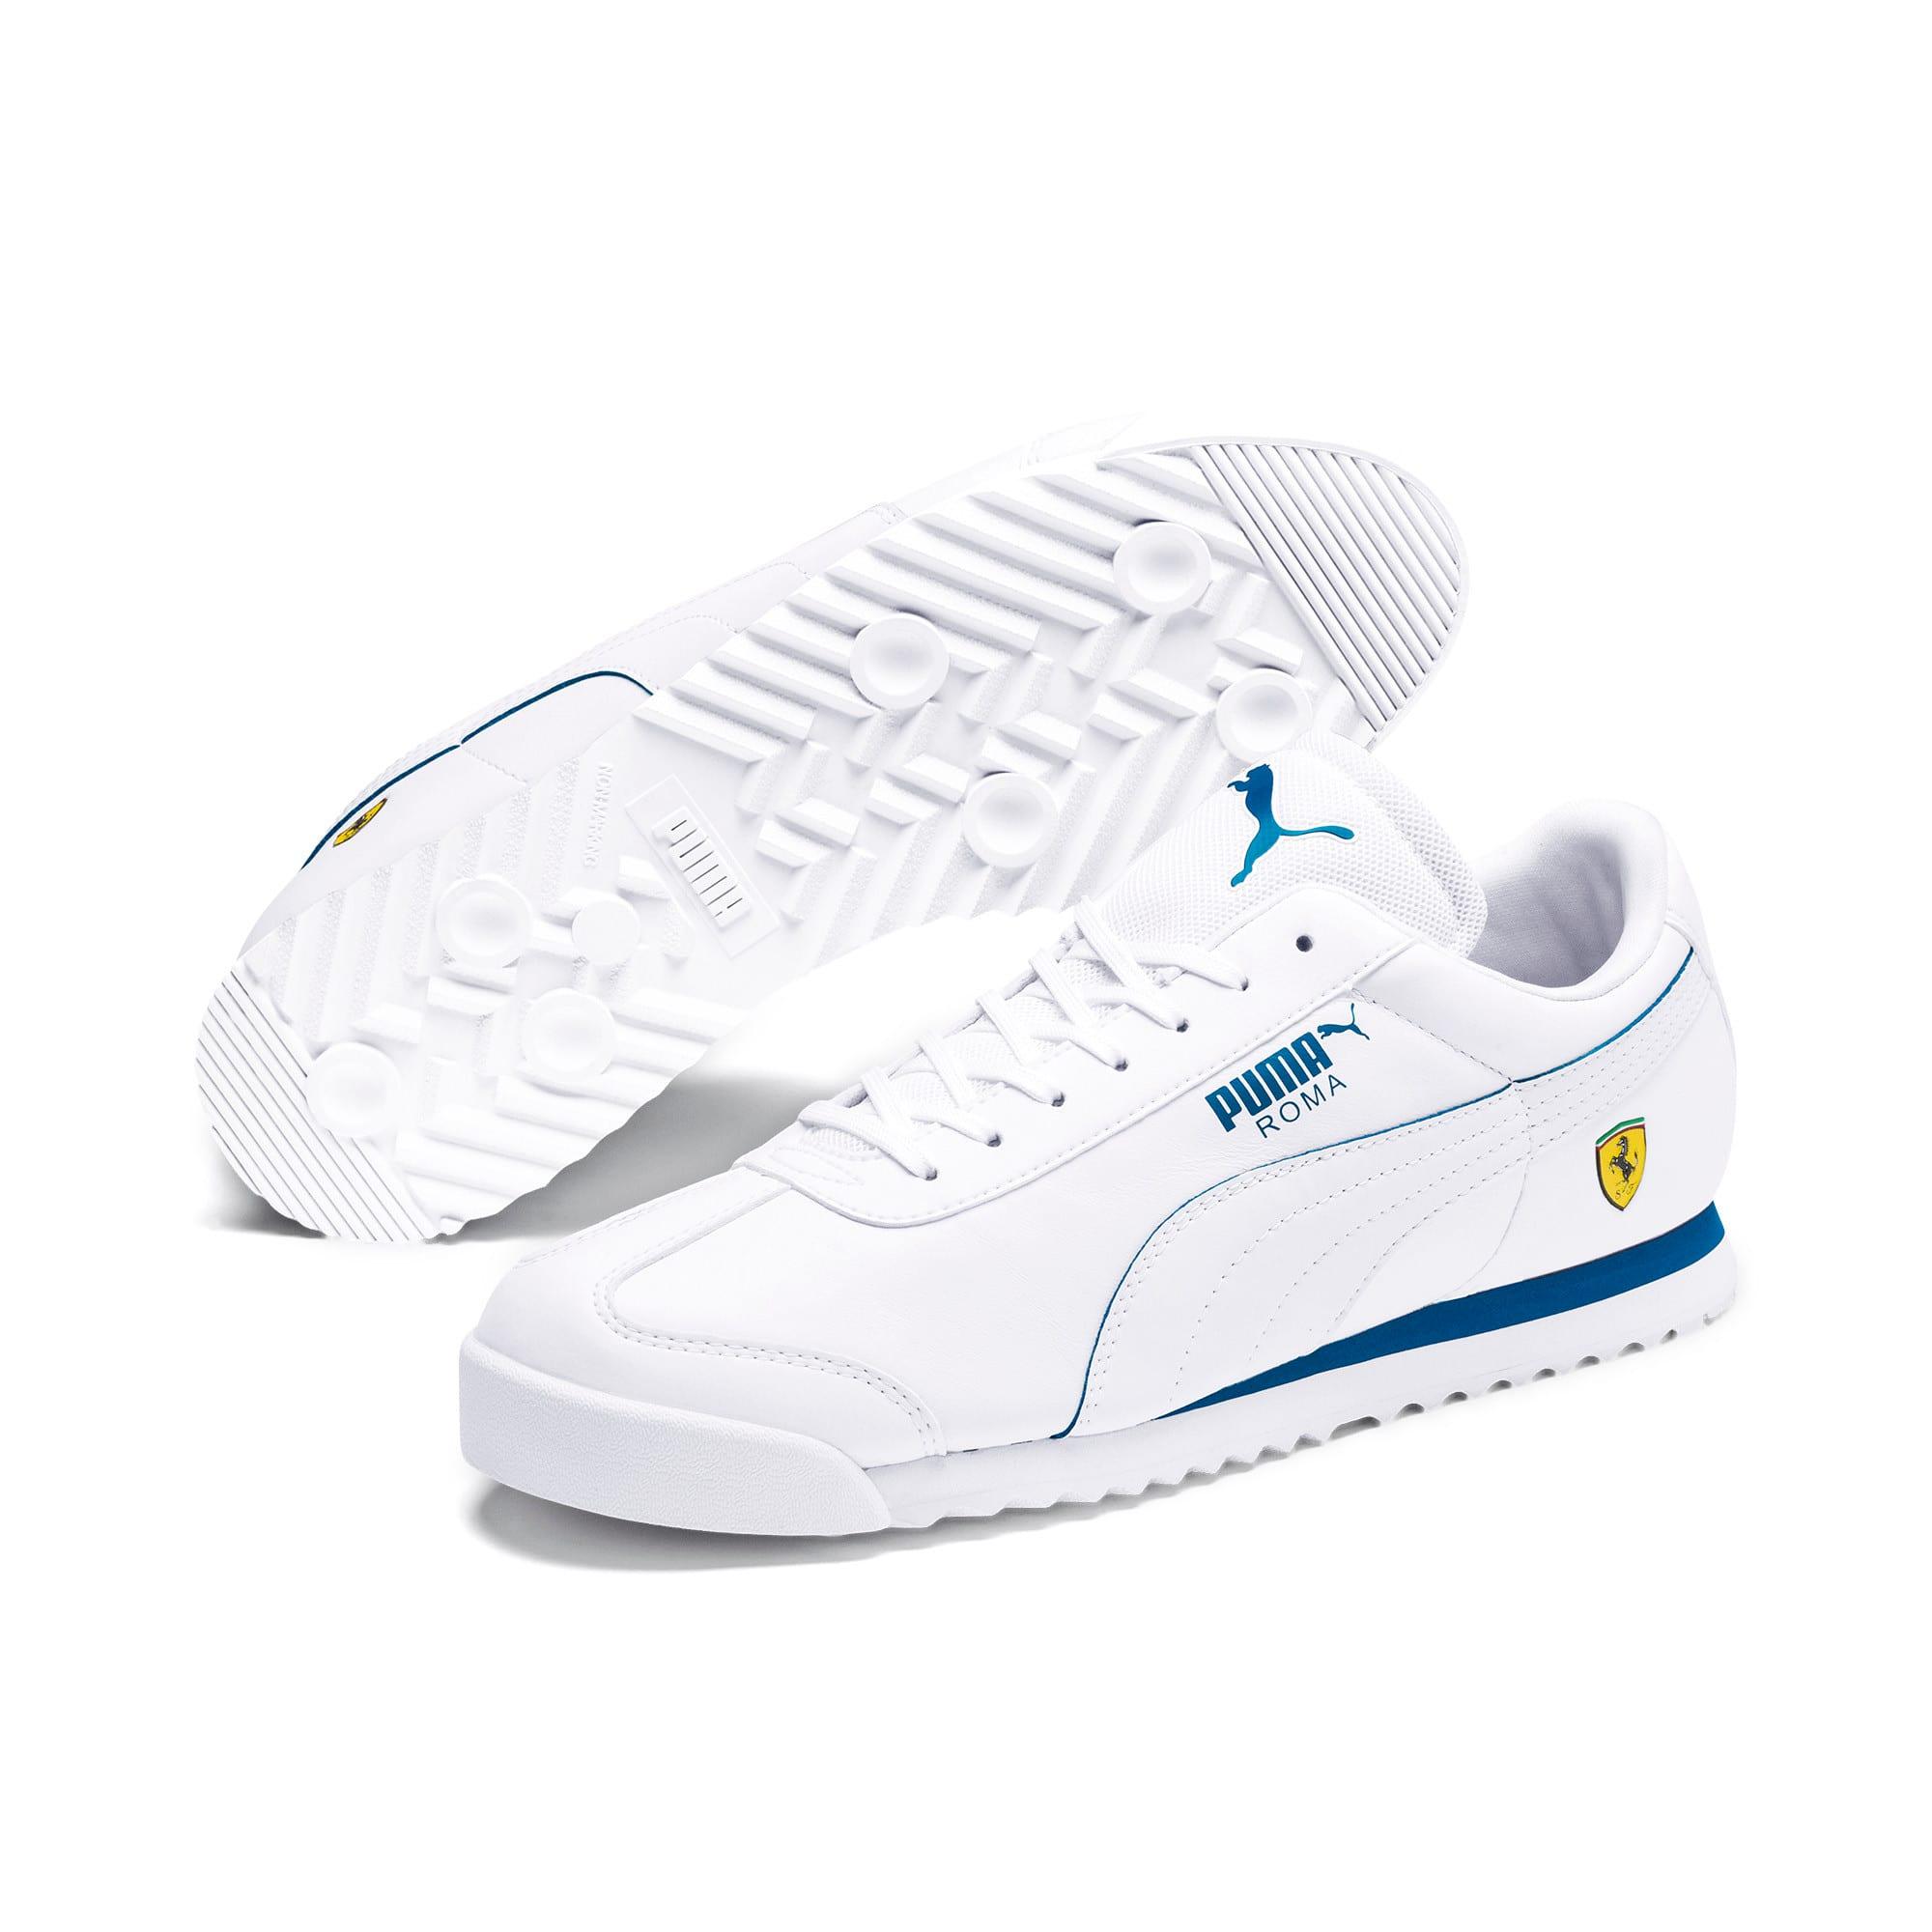 Thumbnail 2 of Scuderia Ferrari Roma Men's Sneakers, White-White-Galaxy Blue, medium